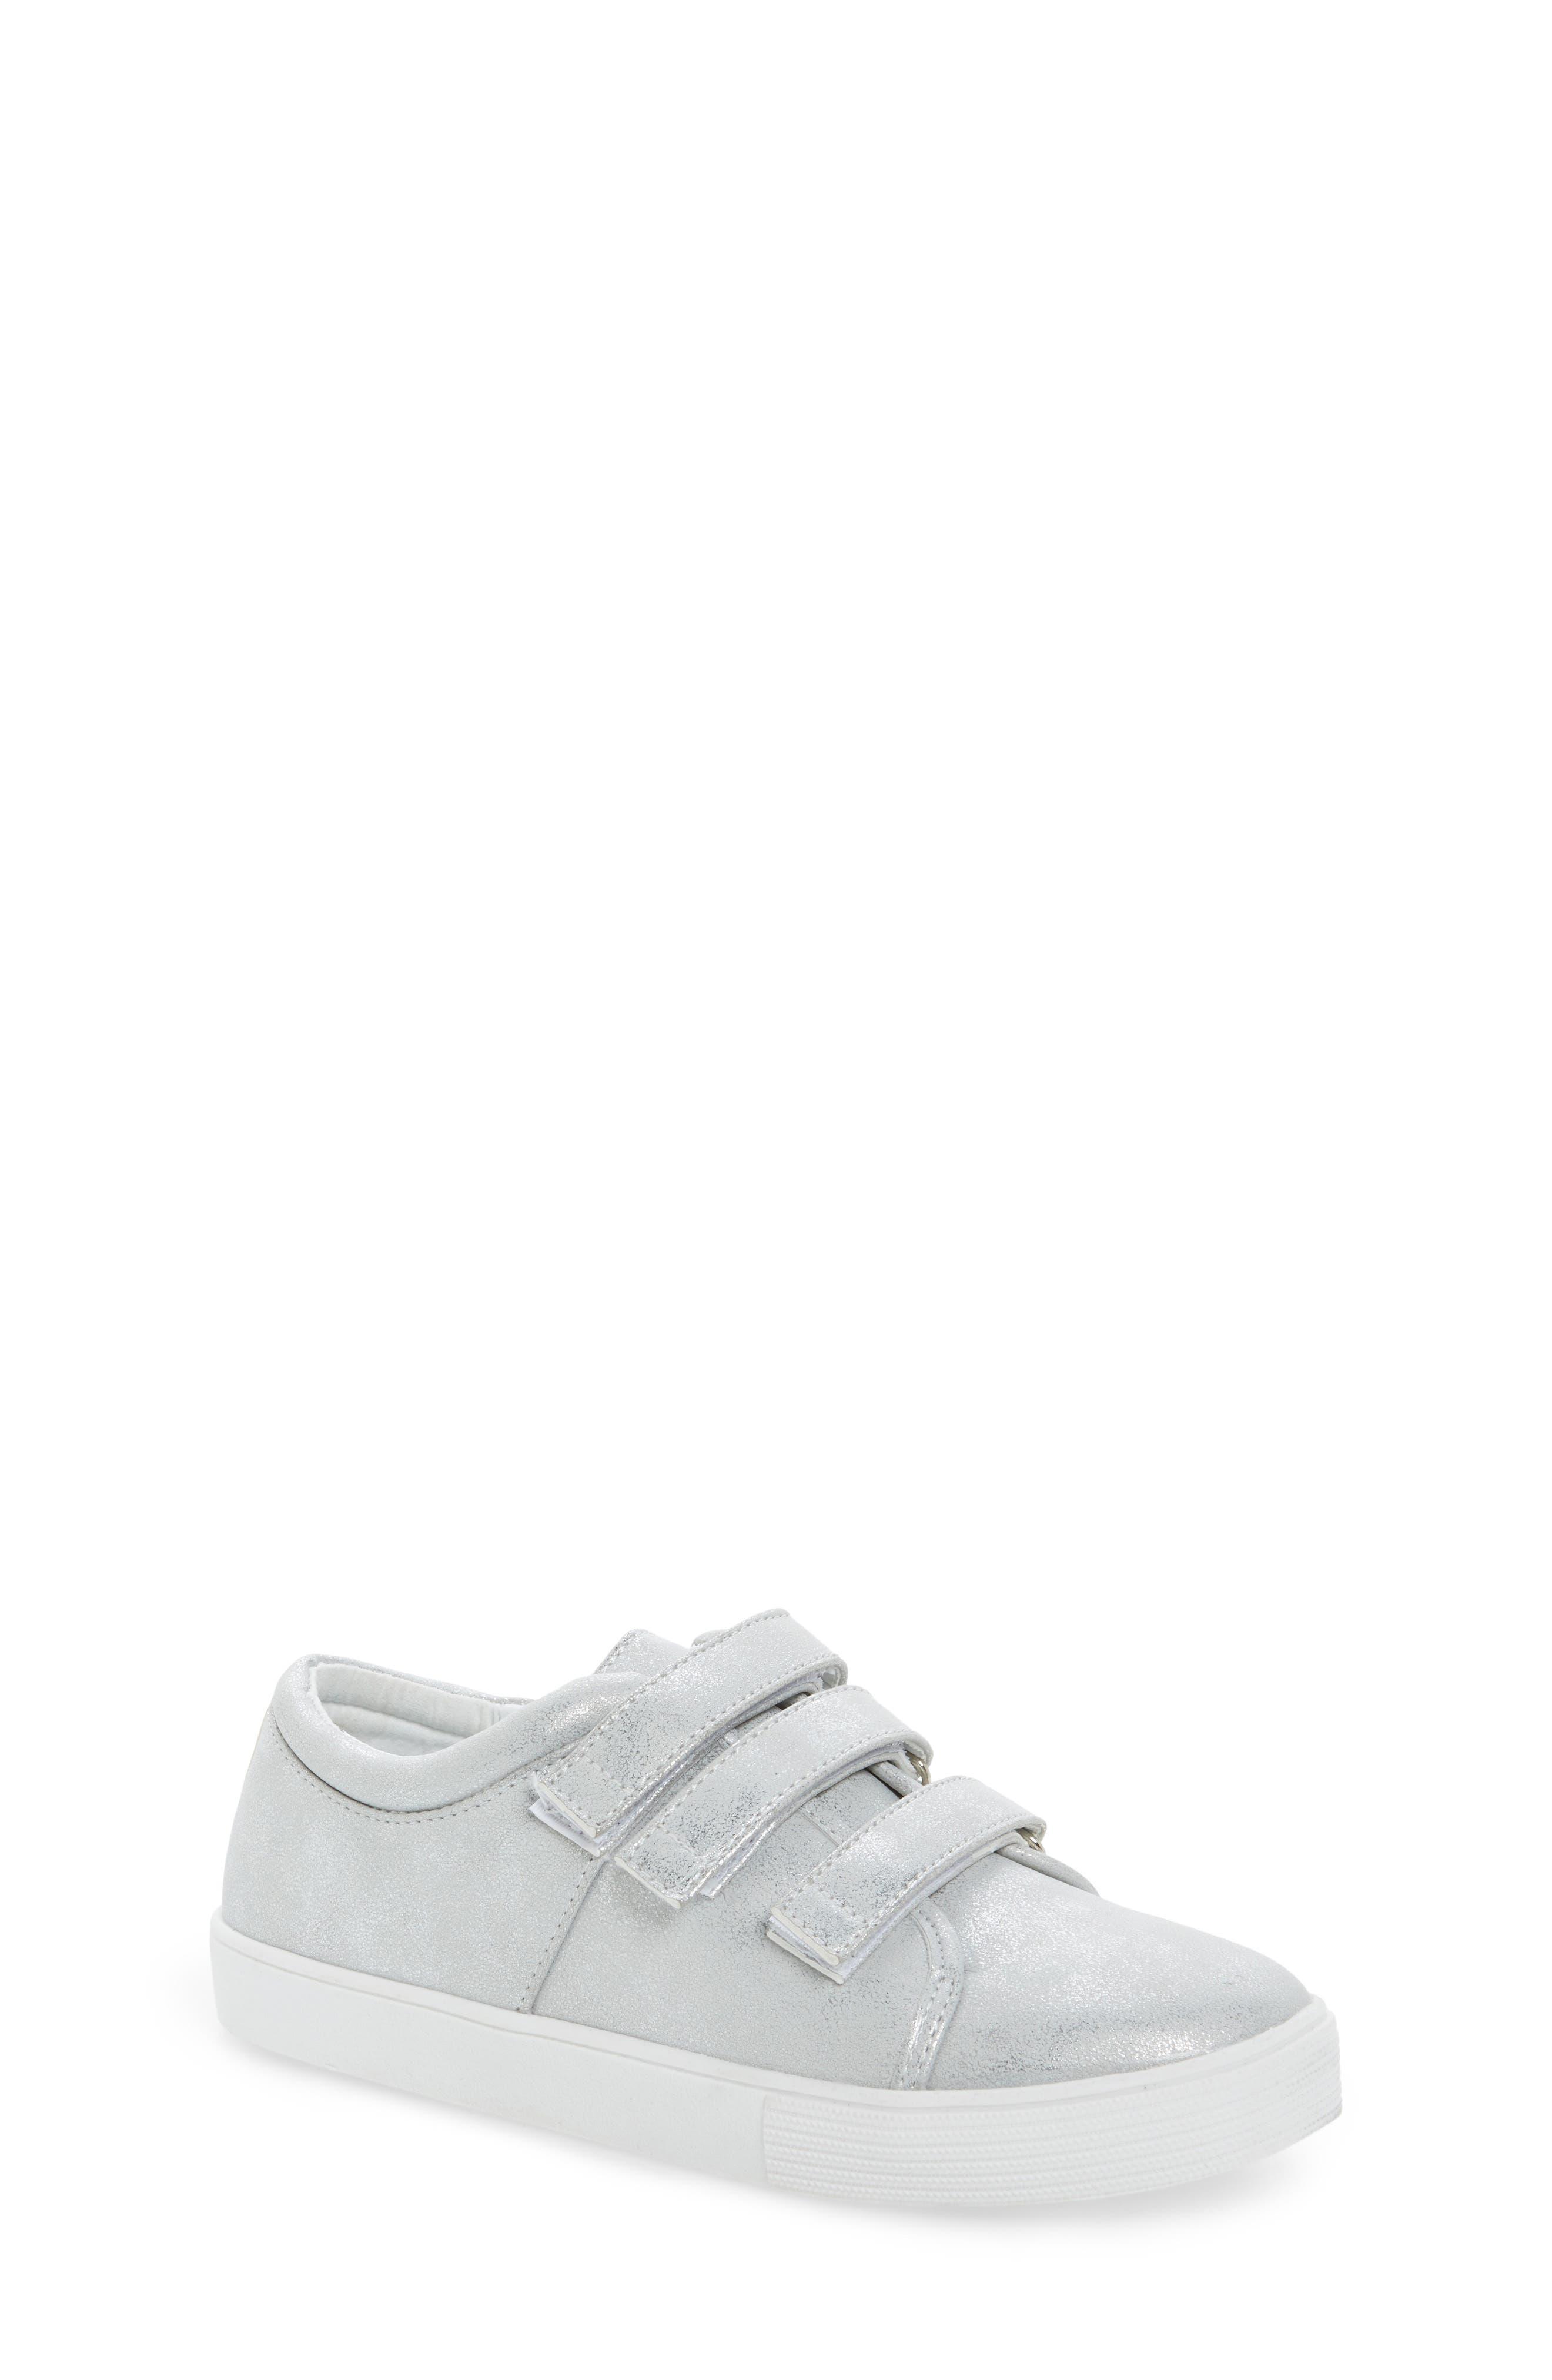 Kam Glitter Strap Sneaker,                             Main thumbnail 1, color,                             040